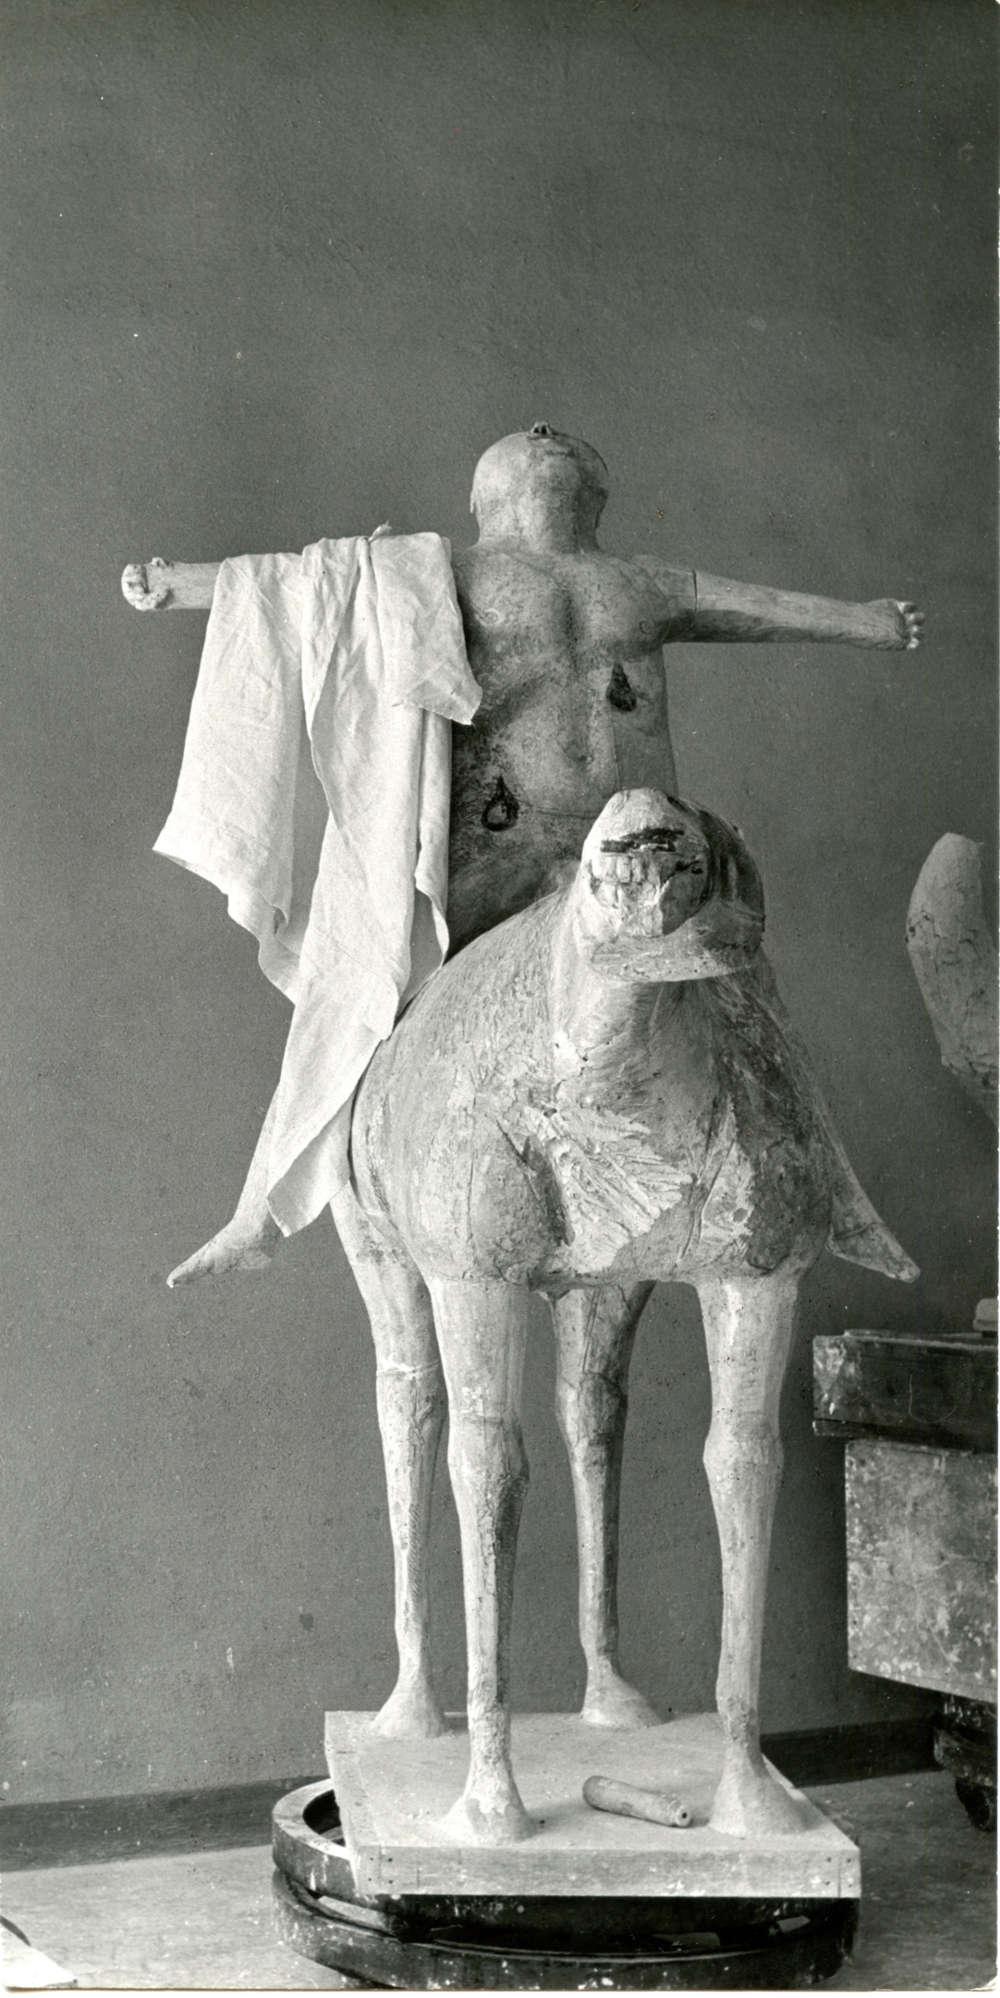 Marino Marini Cavaliere 1948